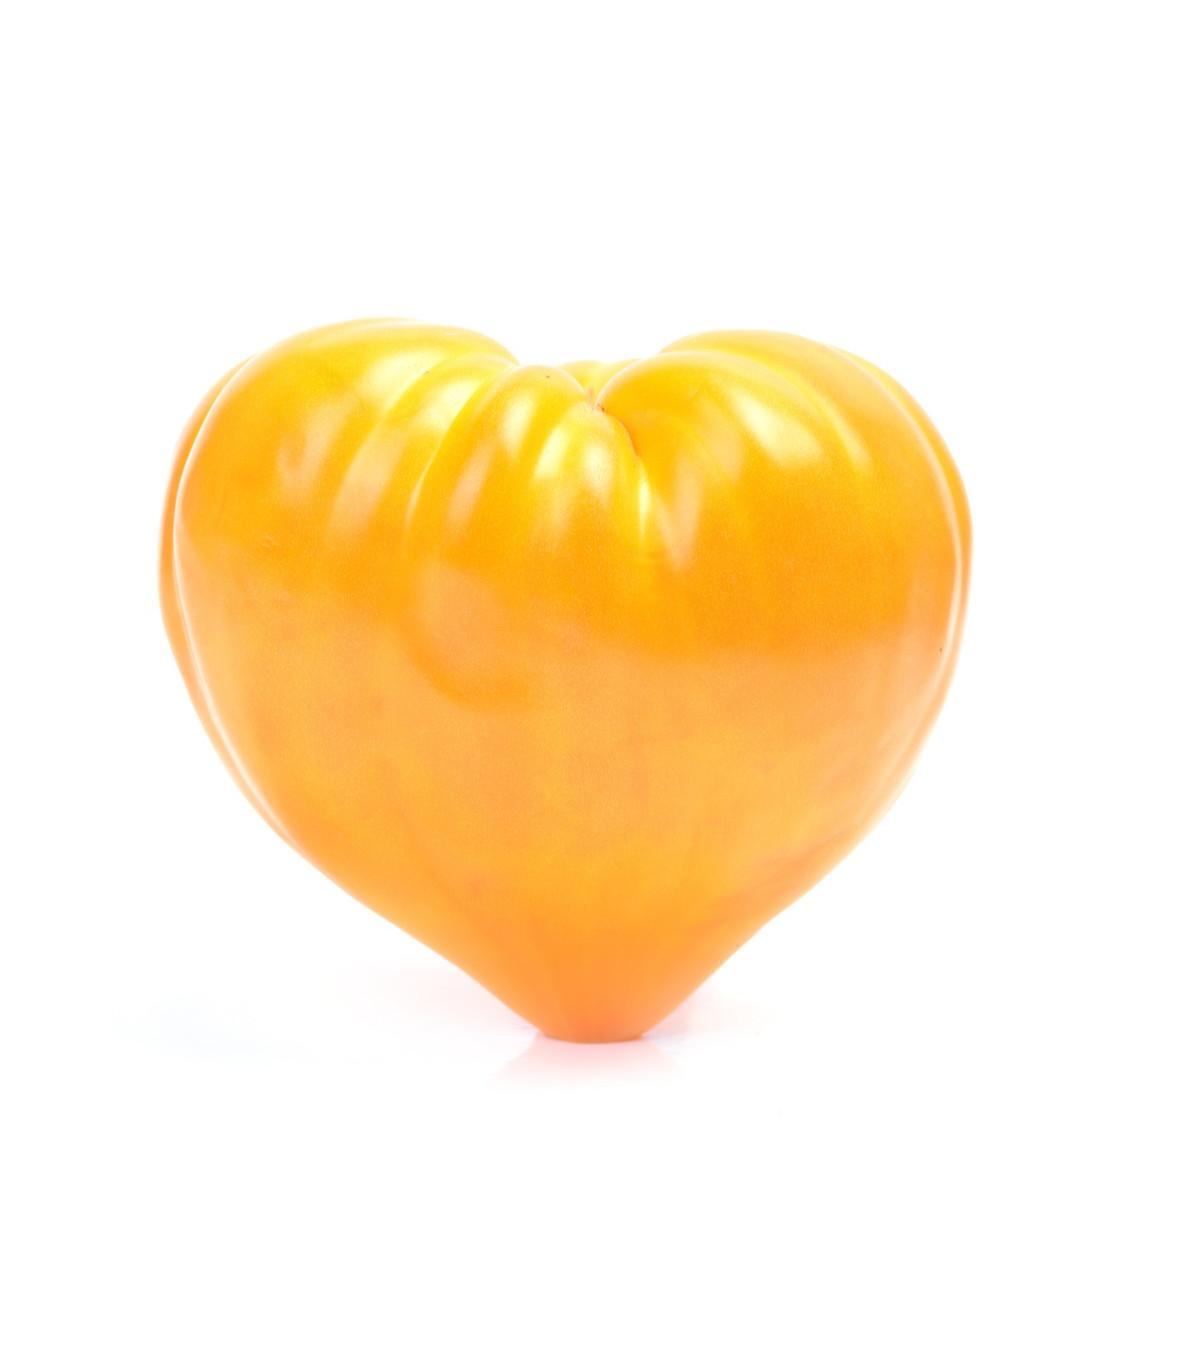 Paradajka - oranžová jahoda - predaj semien - 6 ks